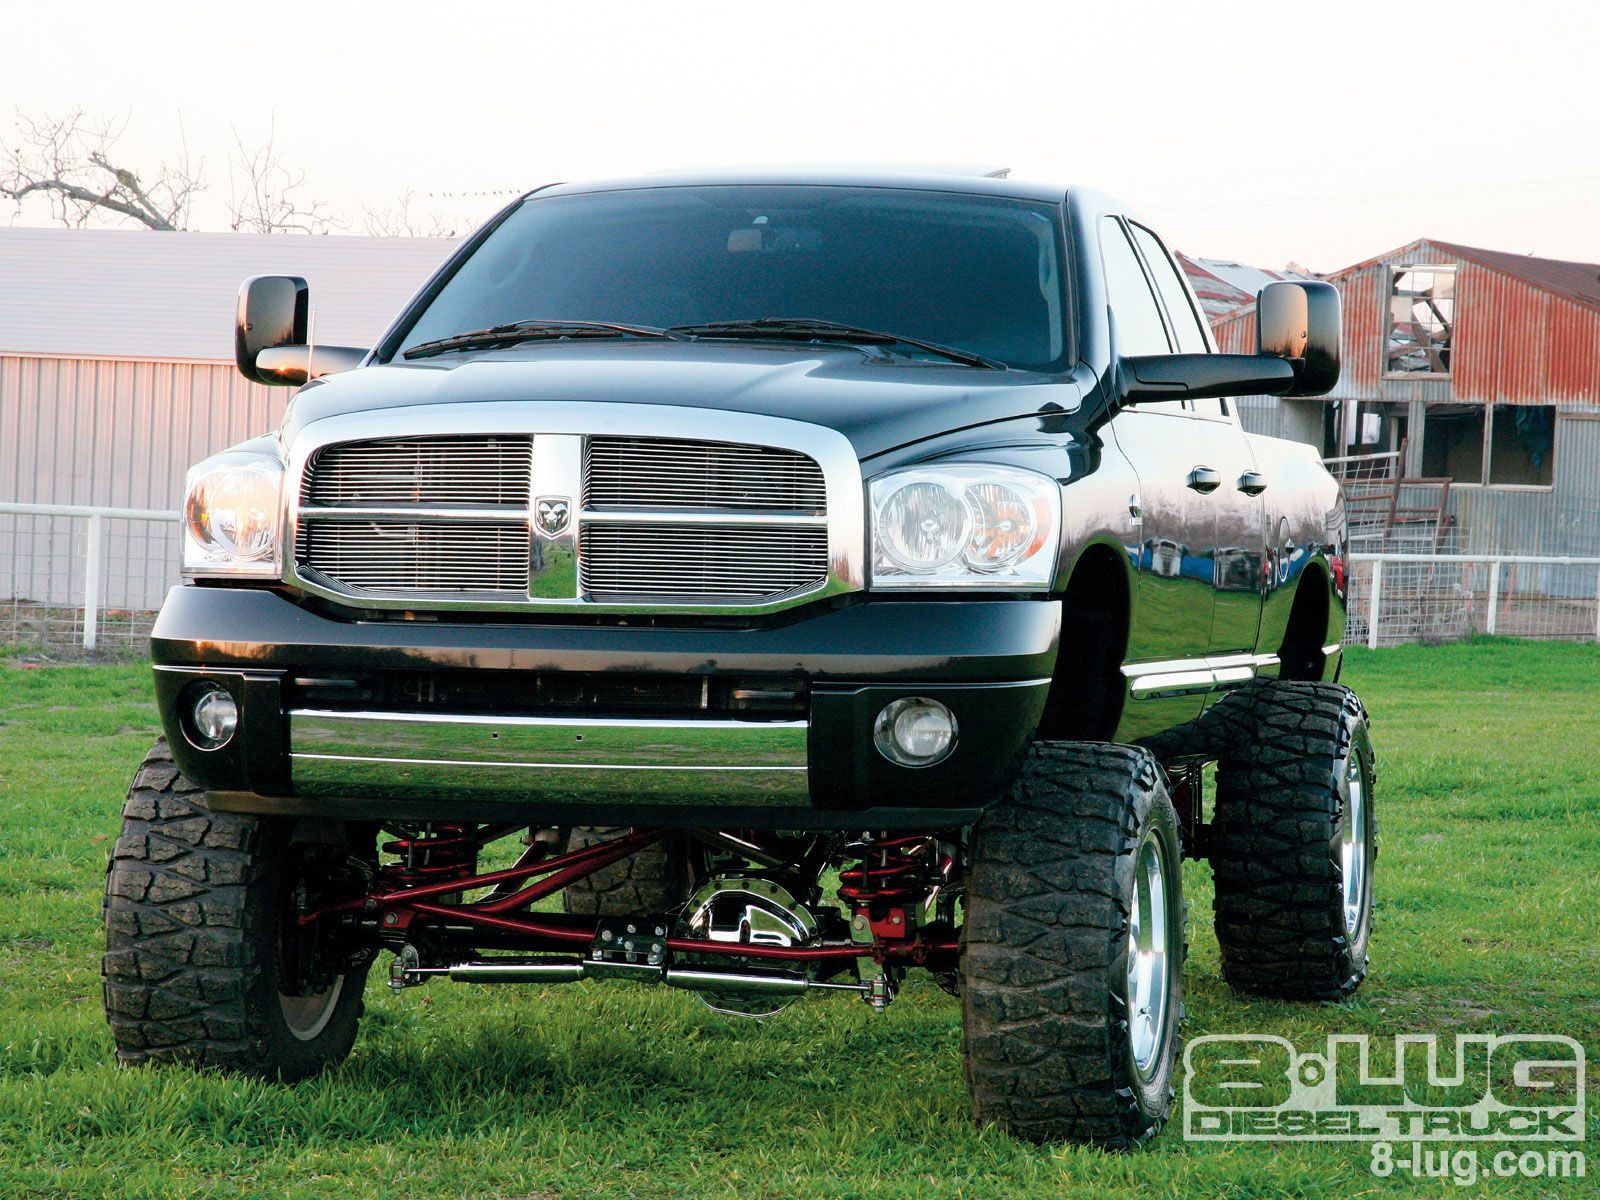 dodge_ram_2500+lifted_truck | Wish list | Pinterest | Dodge rams ...